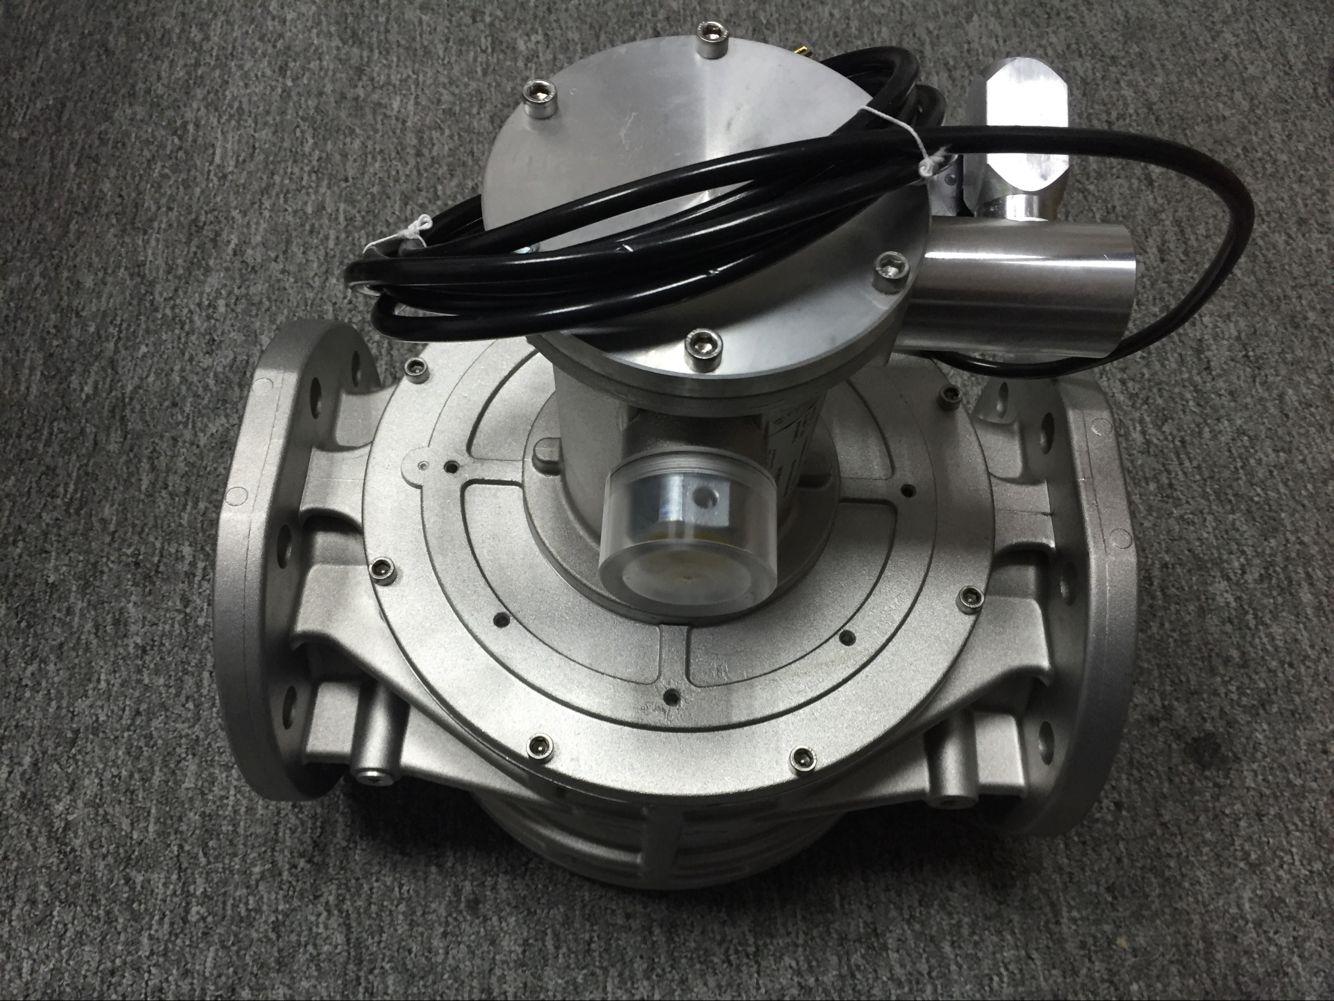 MADAS燃气紧急切断阀常开切断阀M16/RM N.A.马达斯紧急切断电磁阀MADASM16/RM N.A.